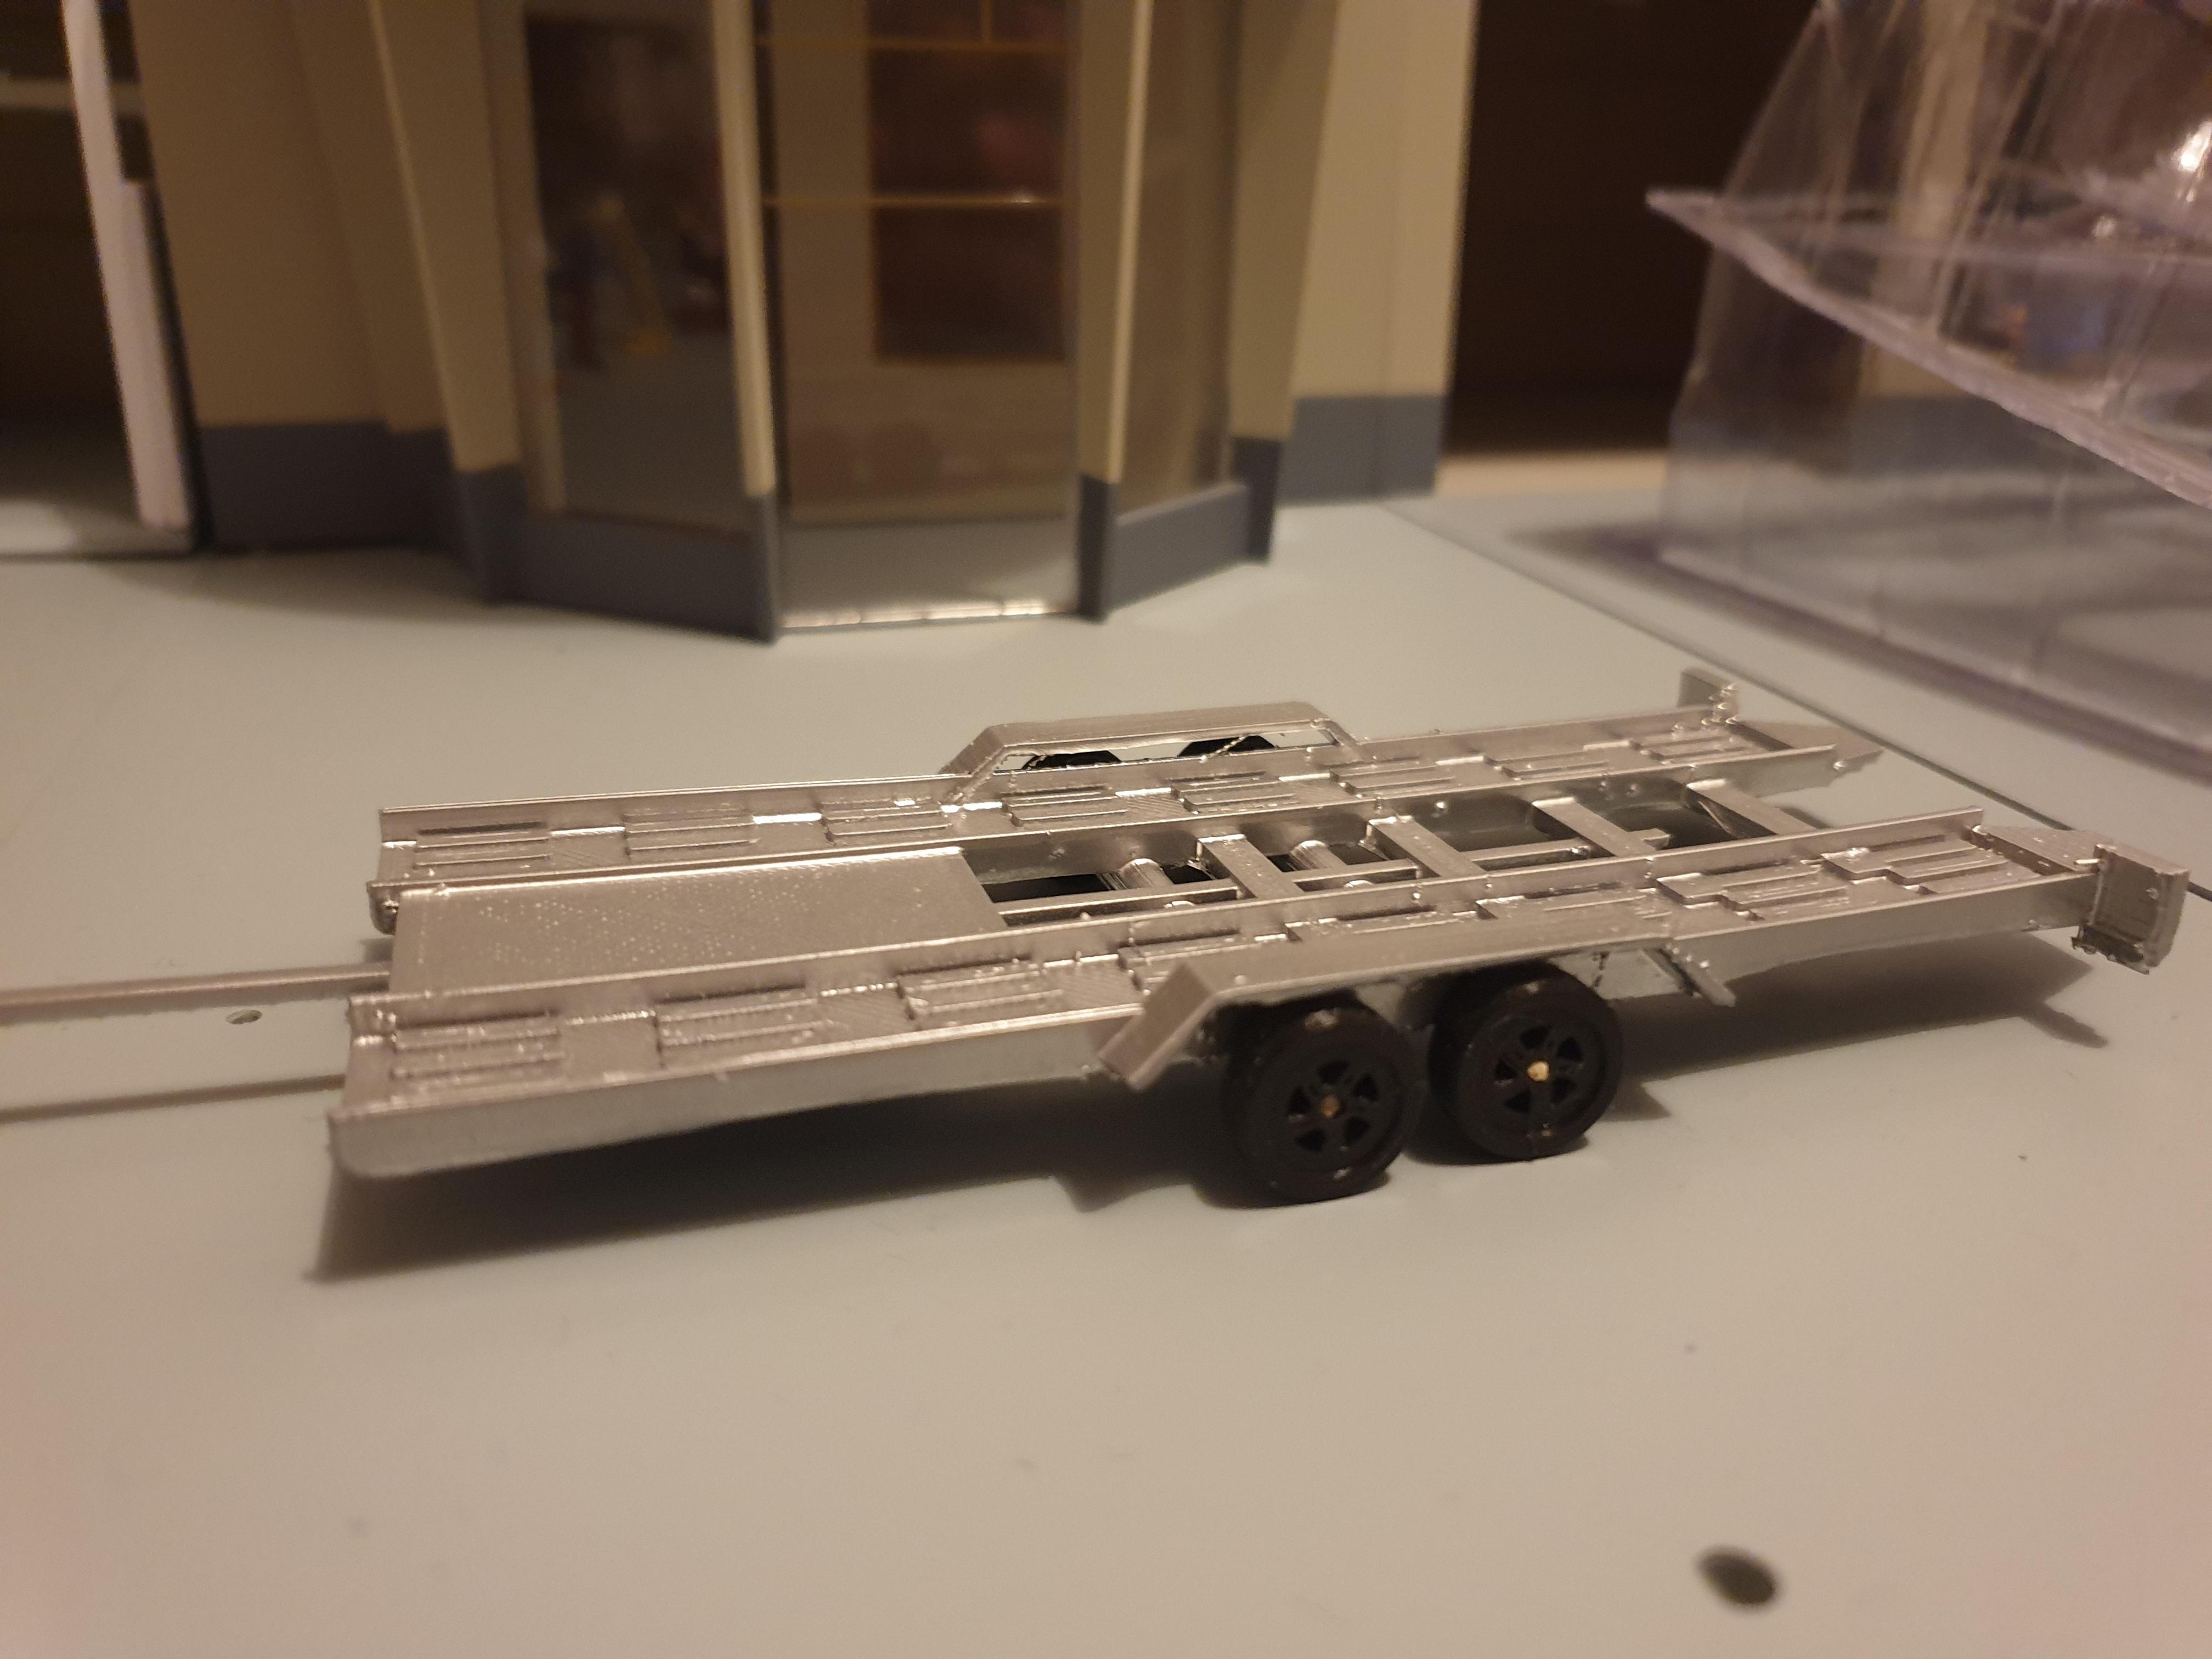 20200604_080138.jpg Download free STL file Car flatbed trailer • Object to 3D print, Garage143